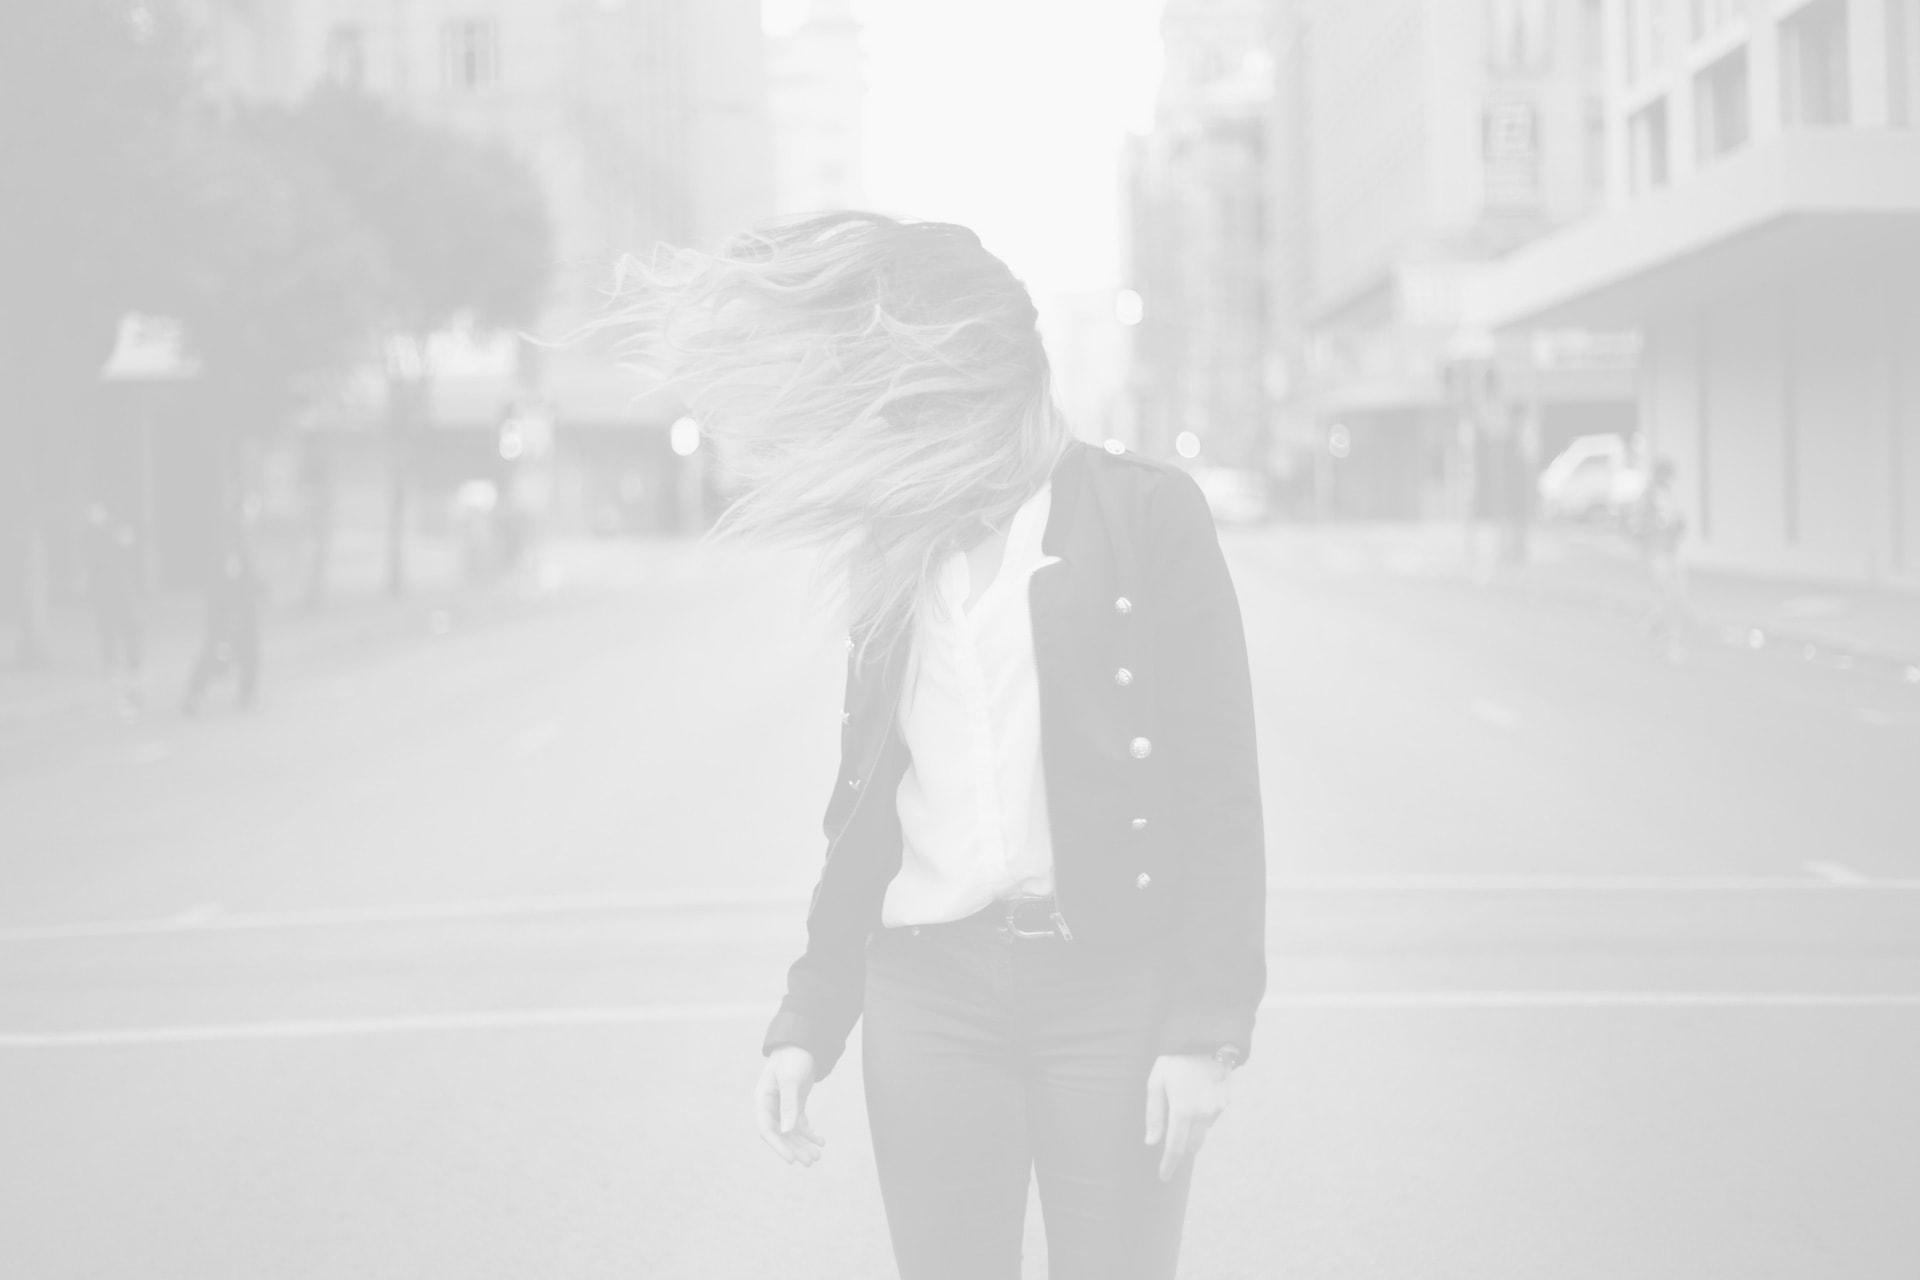 When you are alone